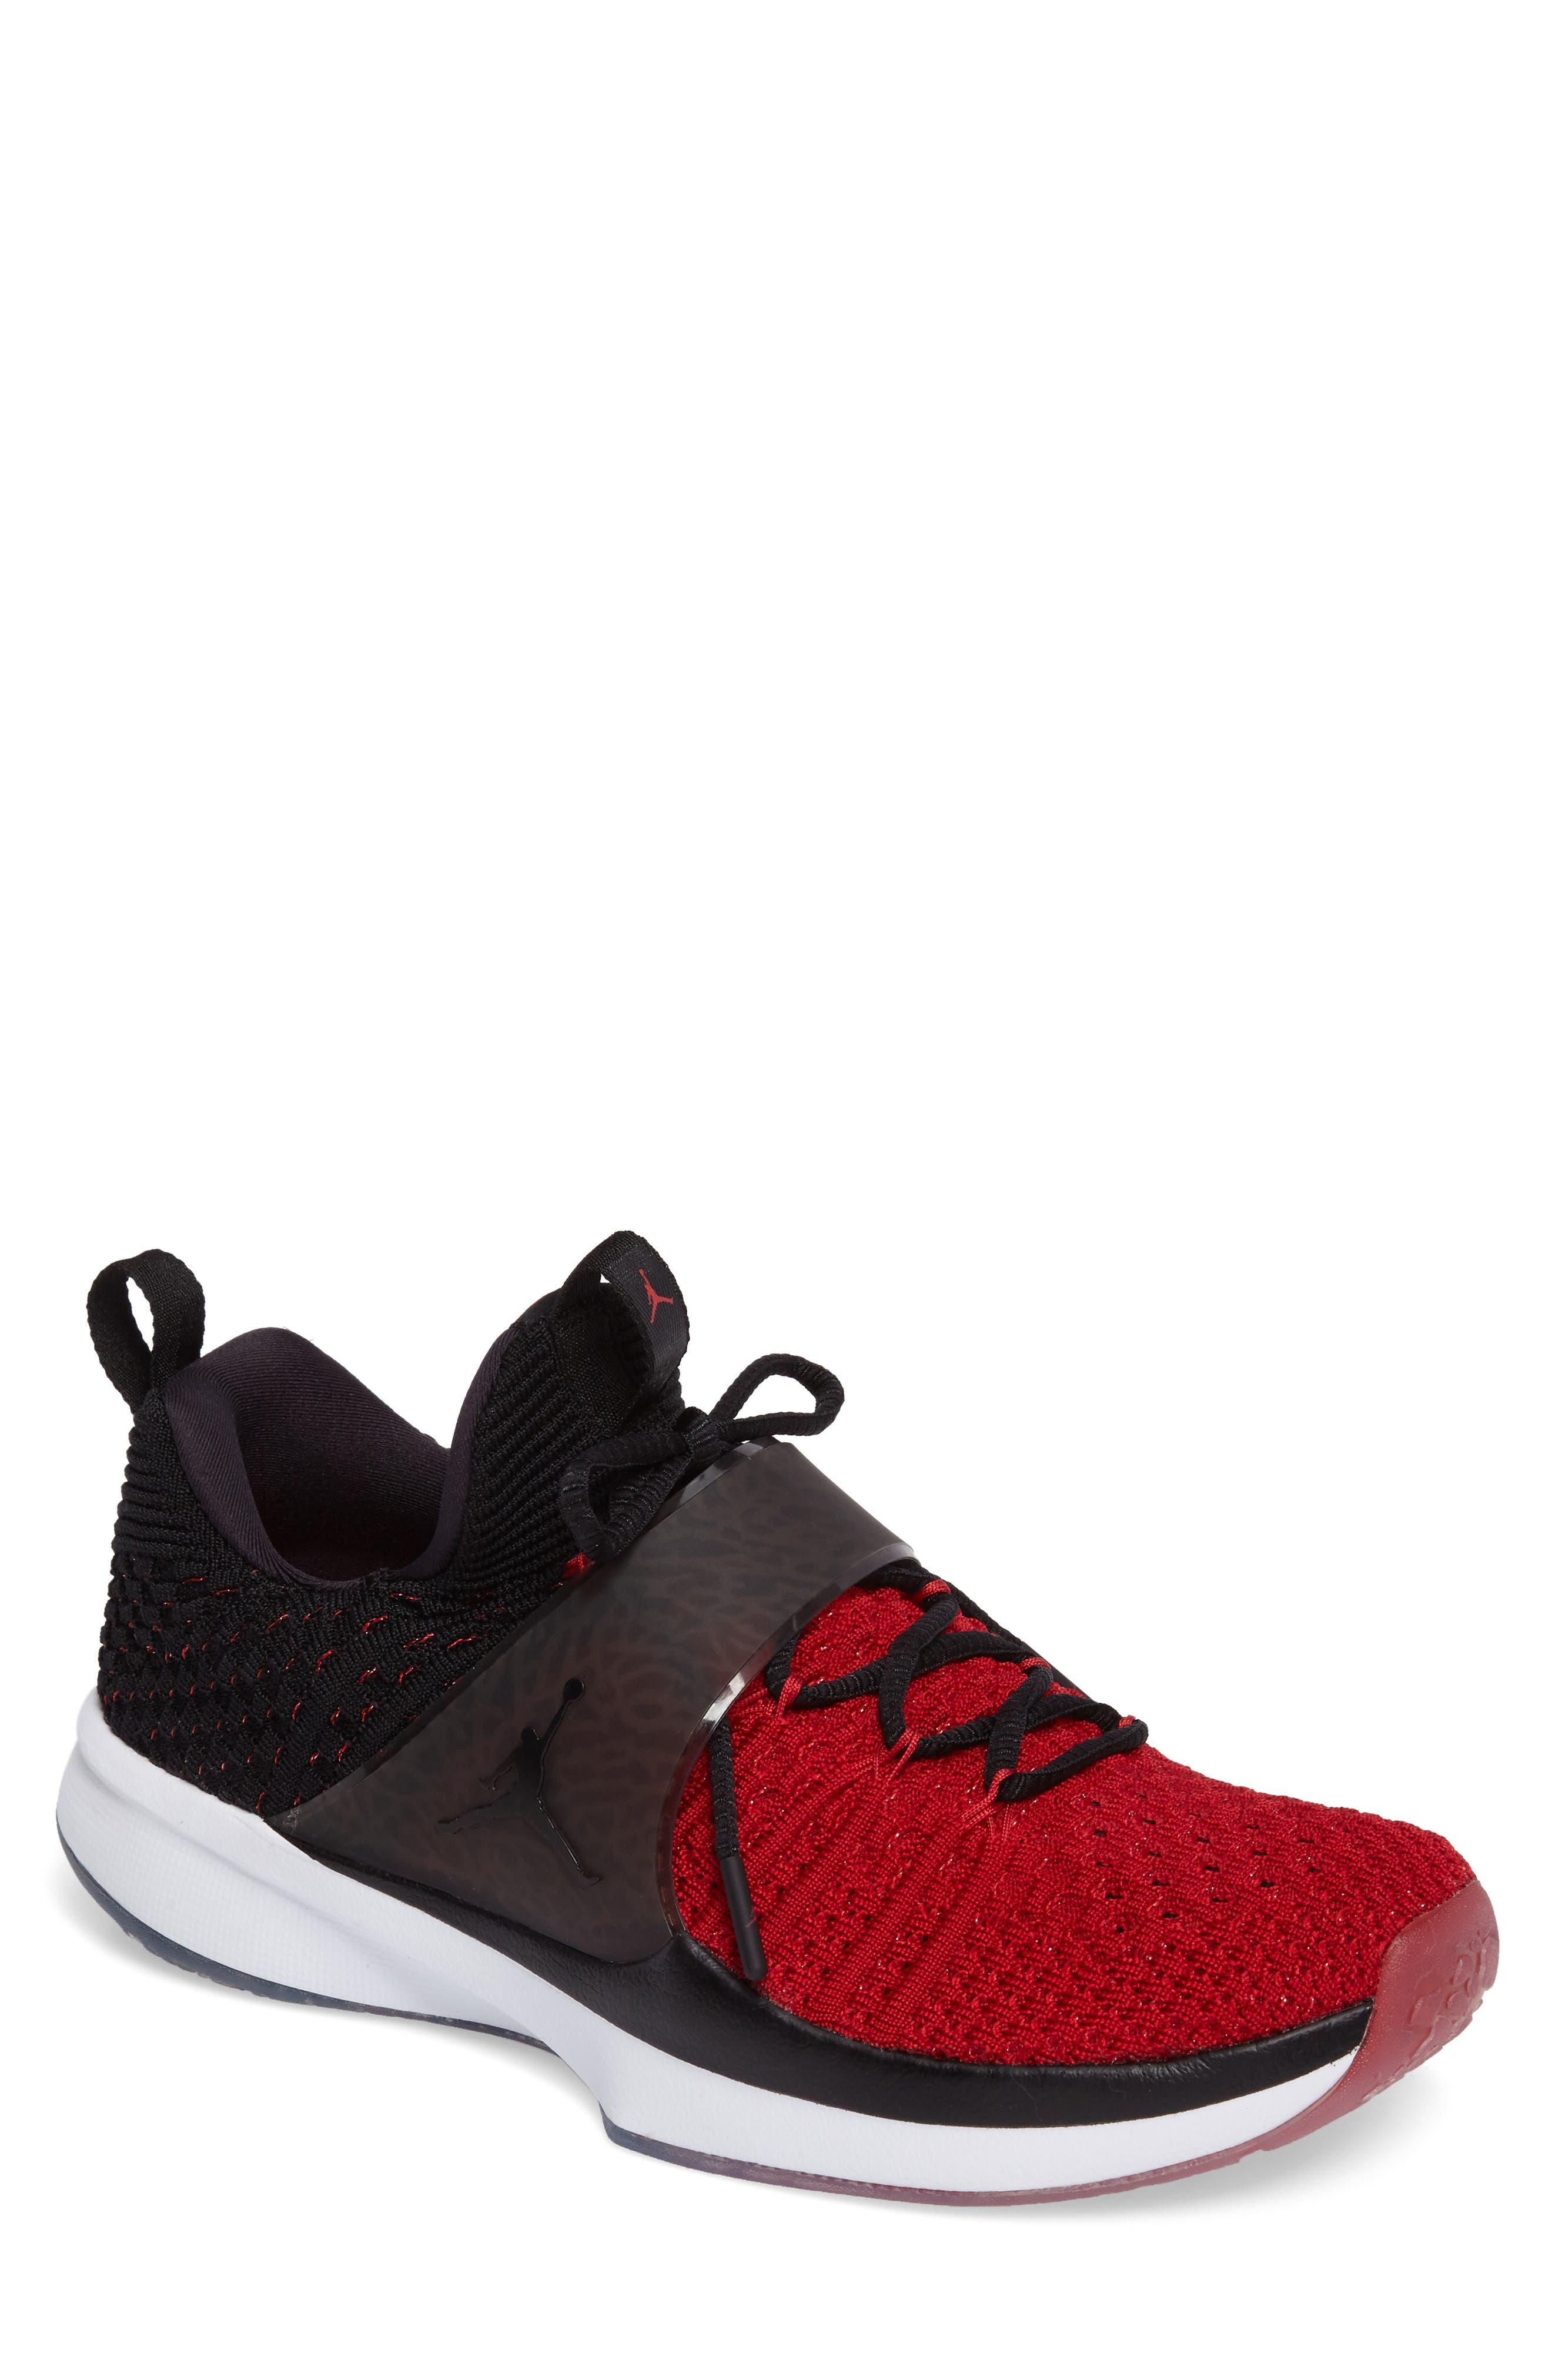 Jordan Flyknit Trainer 2 Low Sneaker,                             Main thumbnail 5, color,